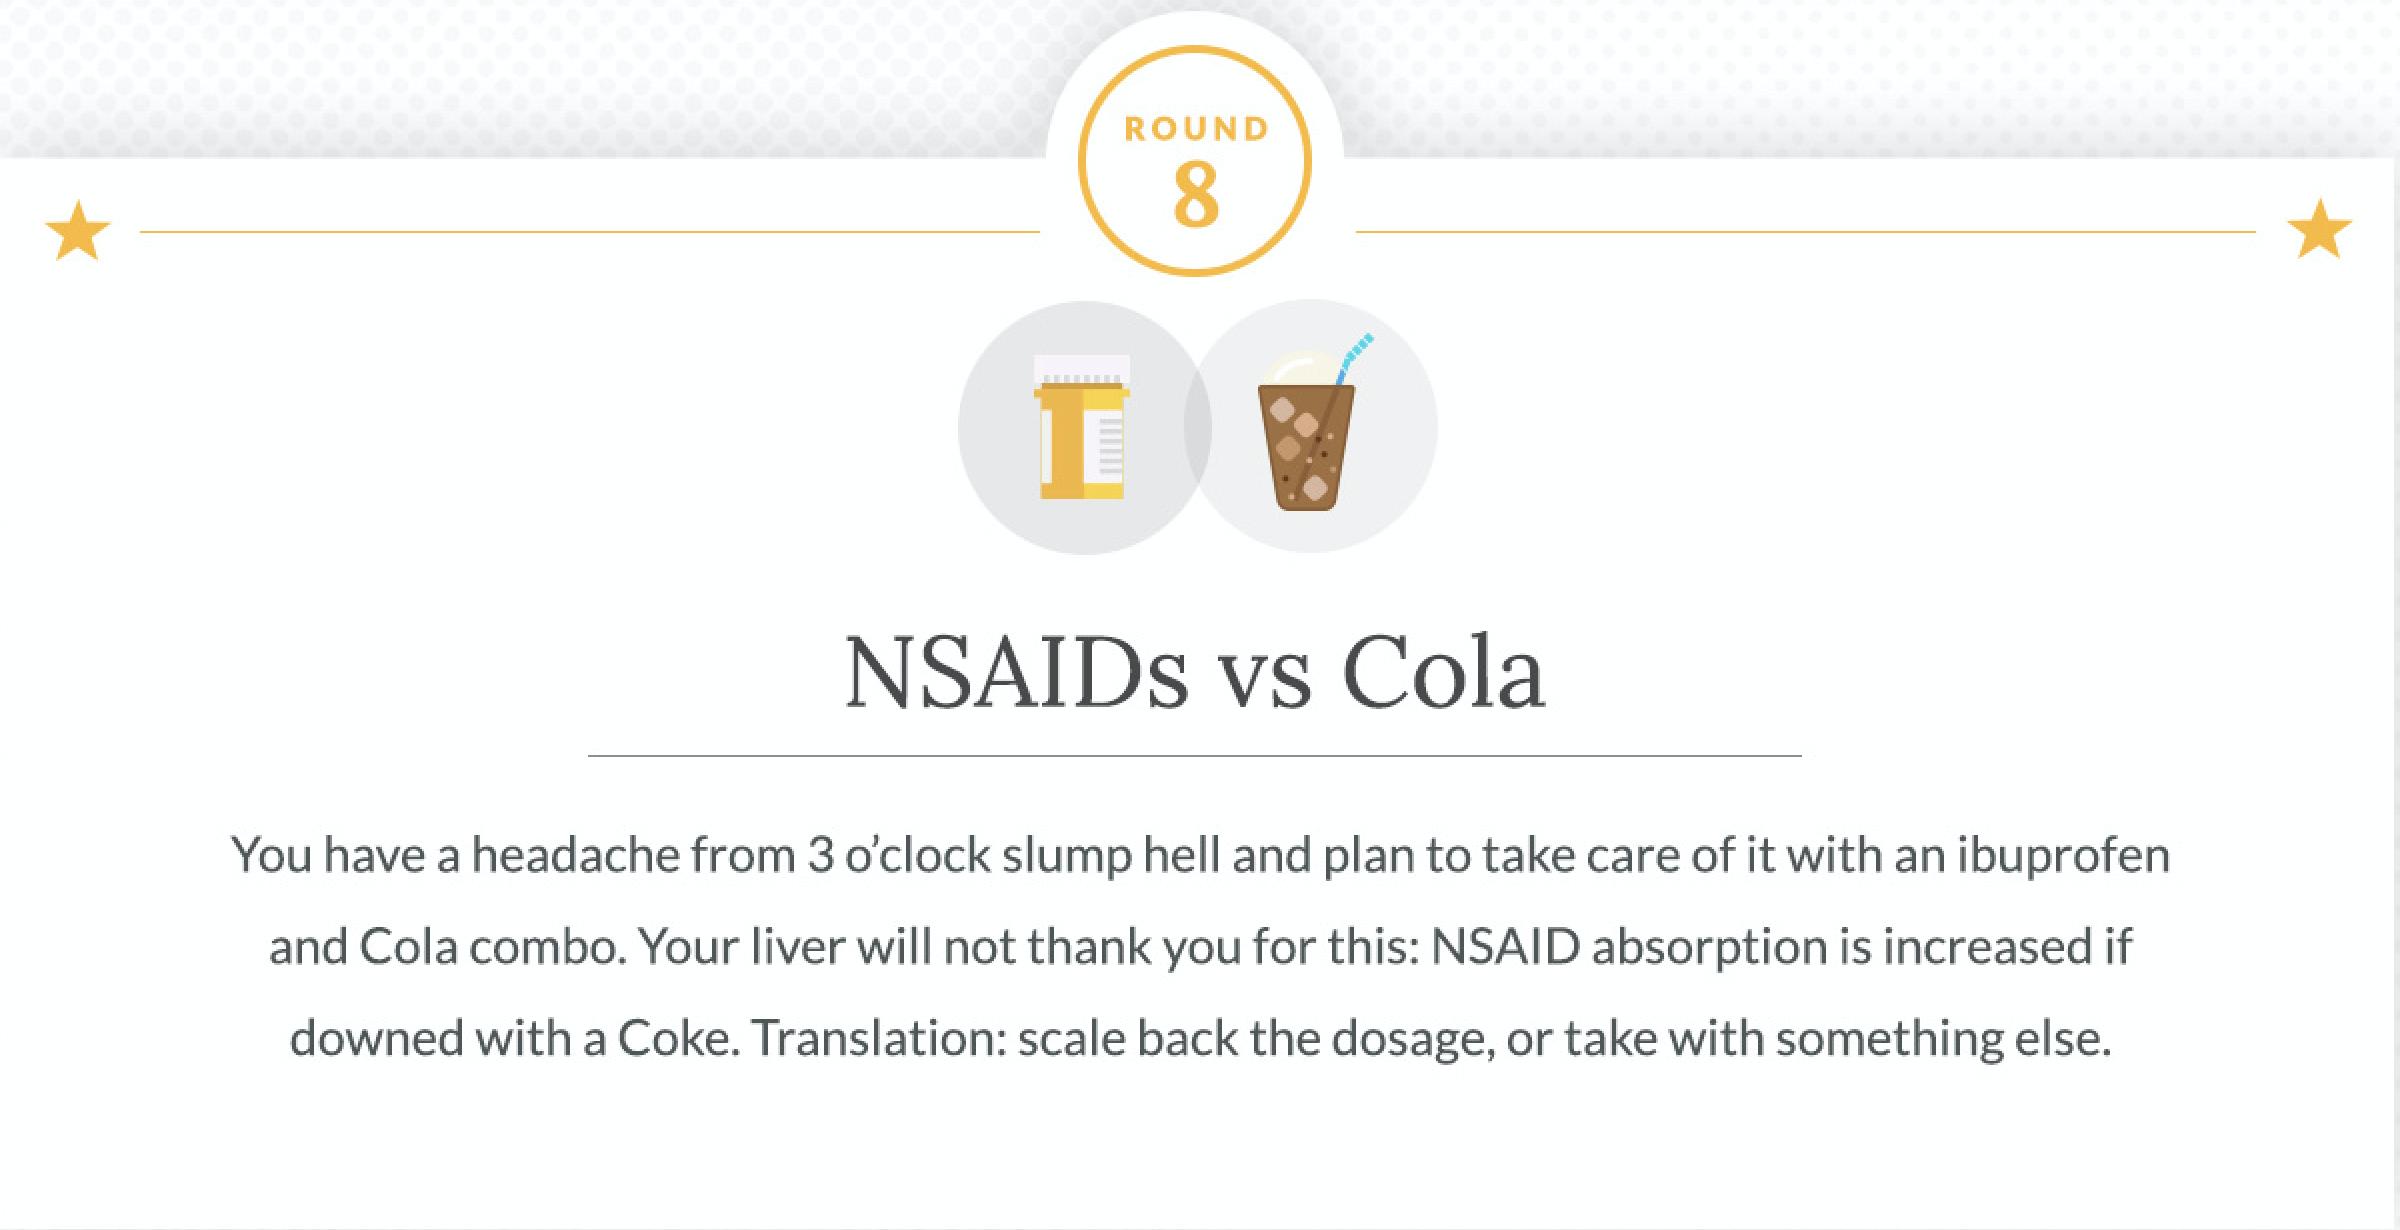 NSAIDs and Cola